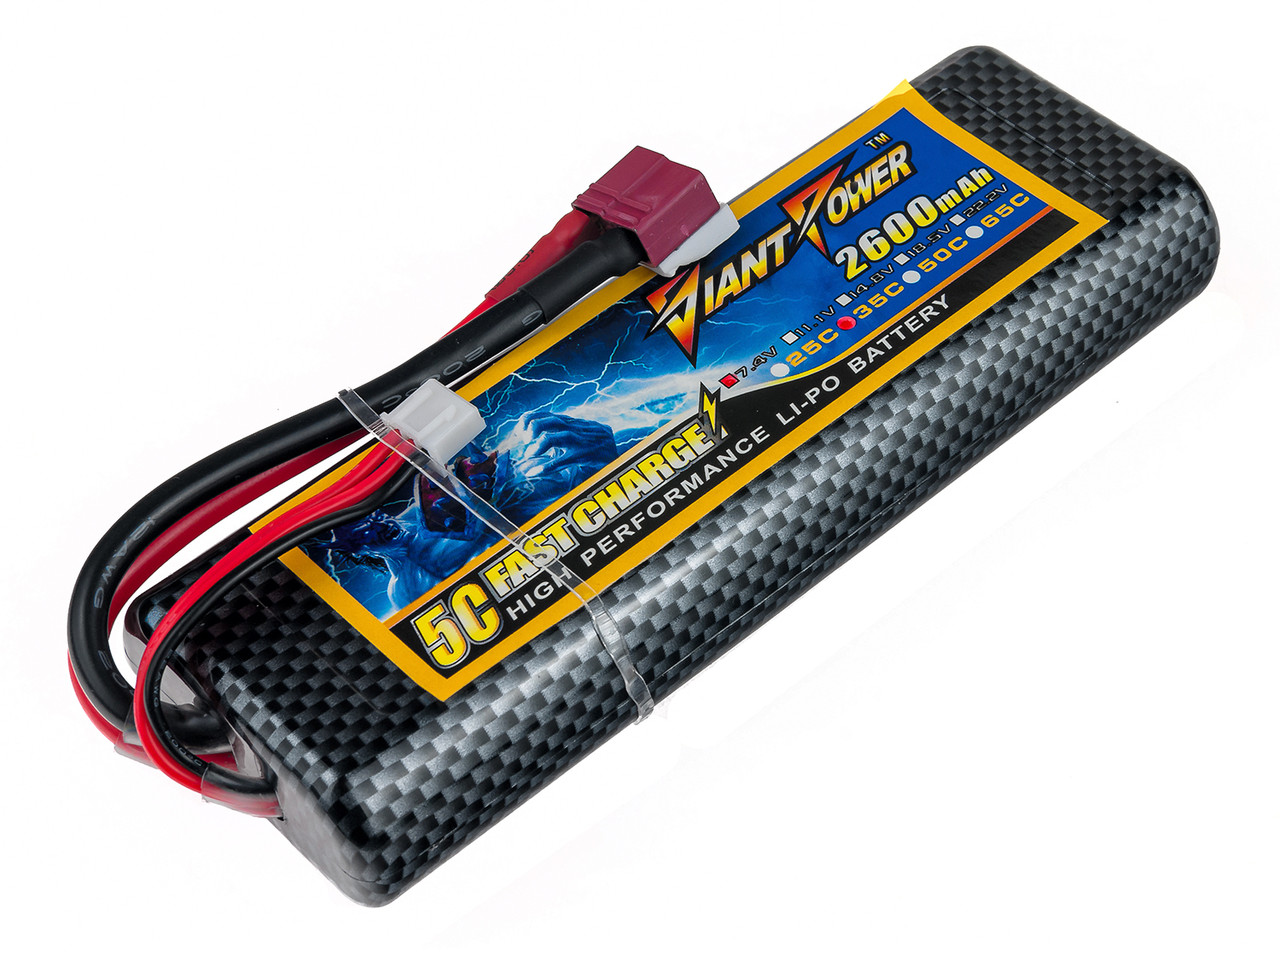 Аккумулятор Giant Power (Dinogy) Li-Pol 2600mAh 7.4V 2S 35C Hardcase 25x46x138мм T-Plug